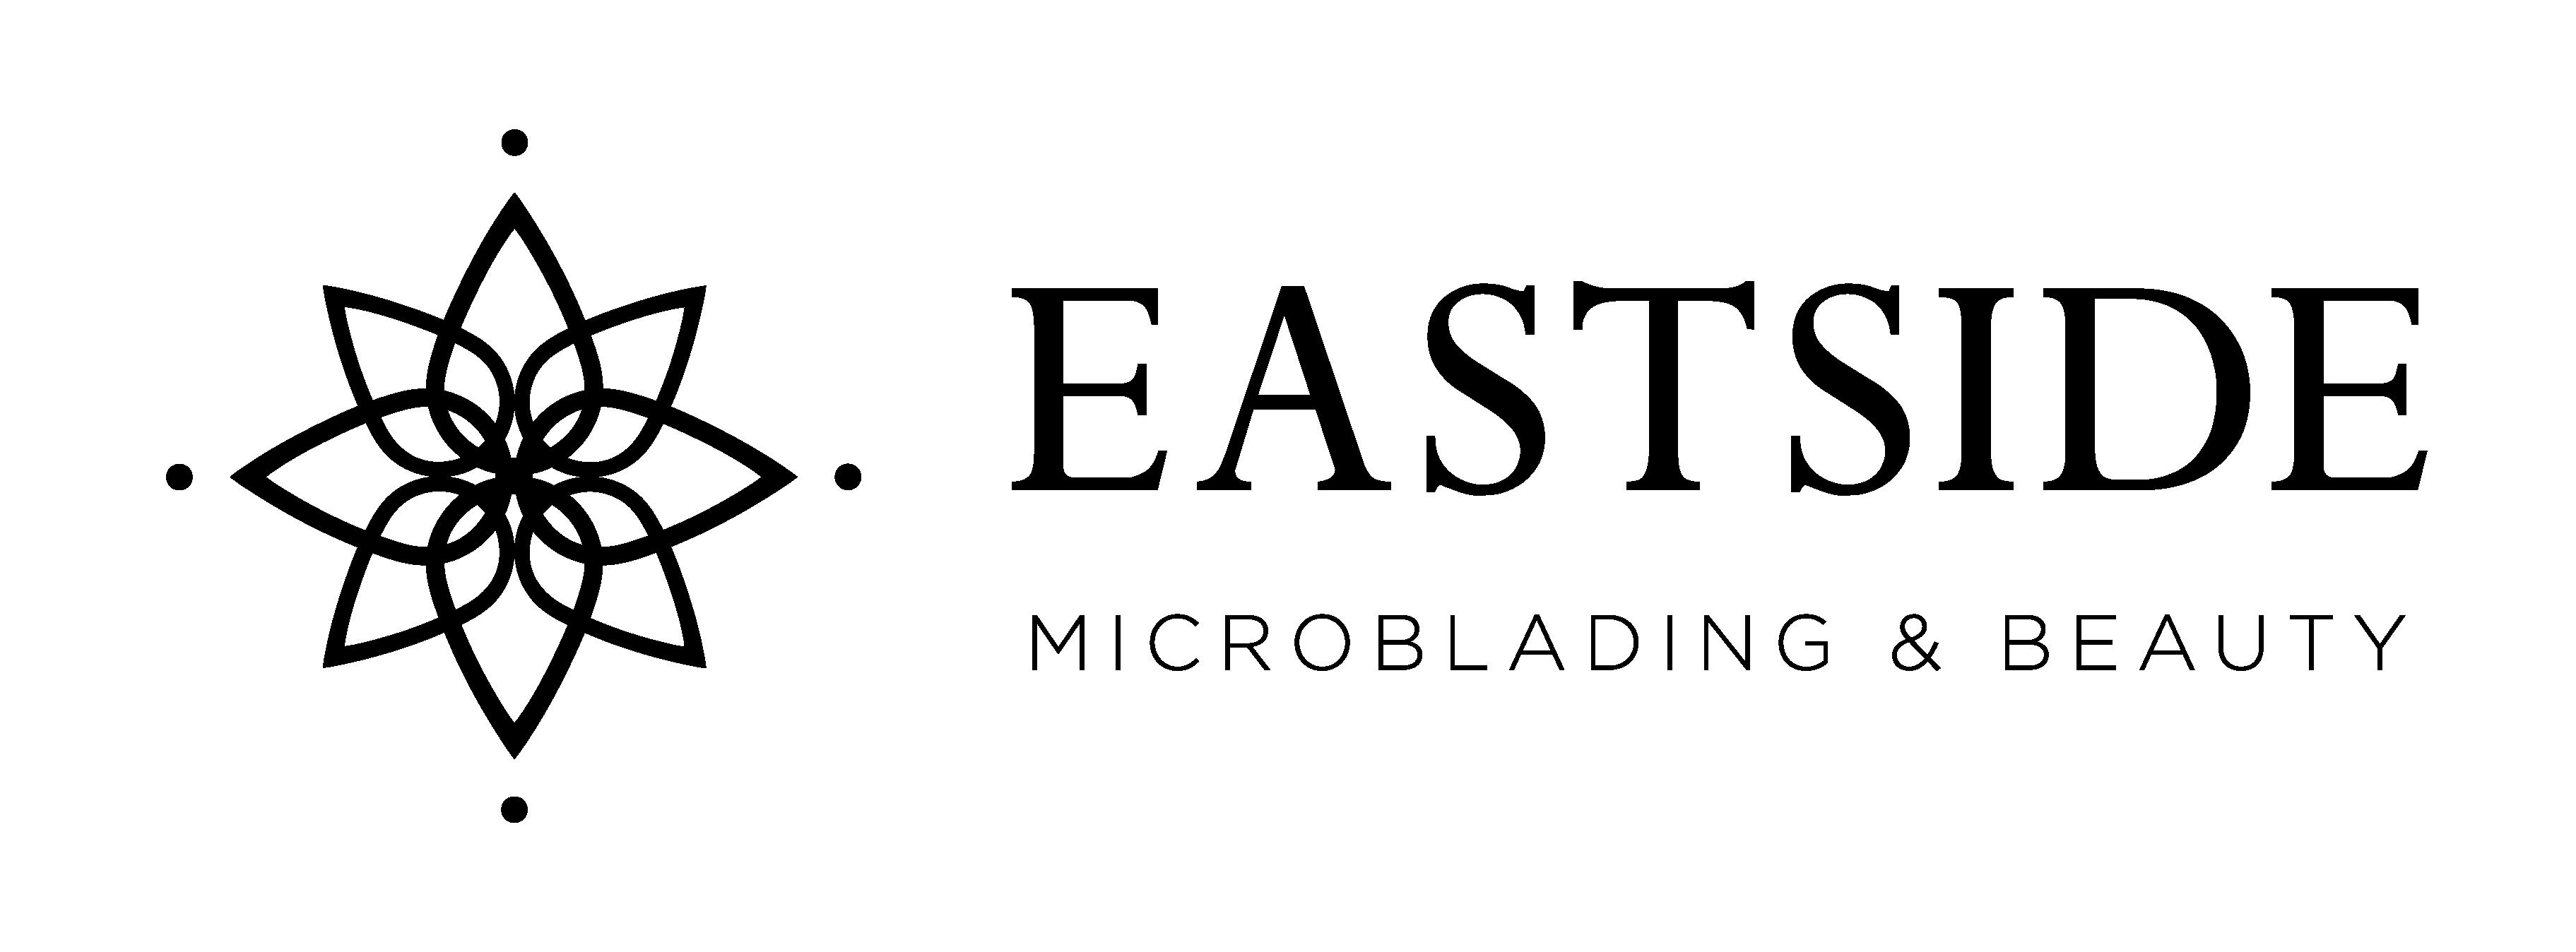 Eastside Microblading Studio